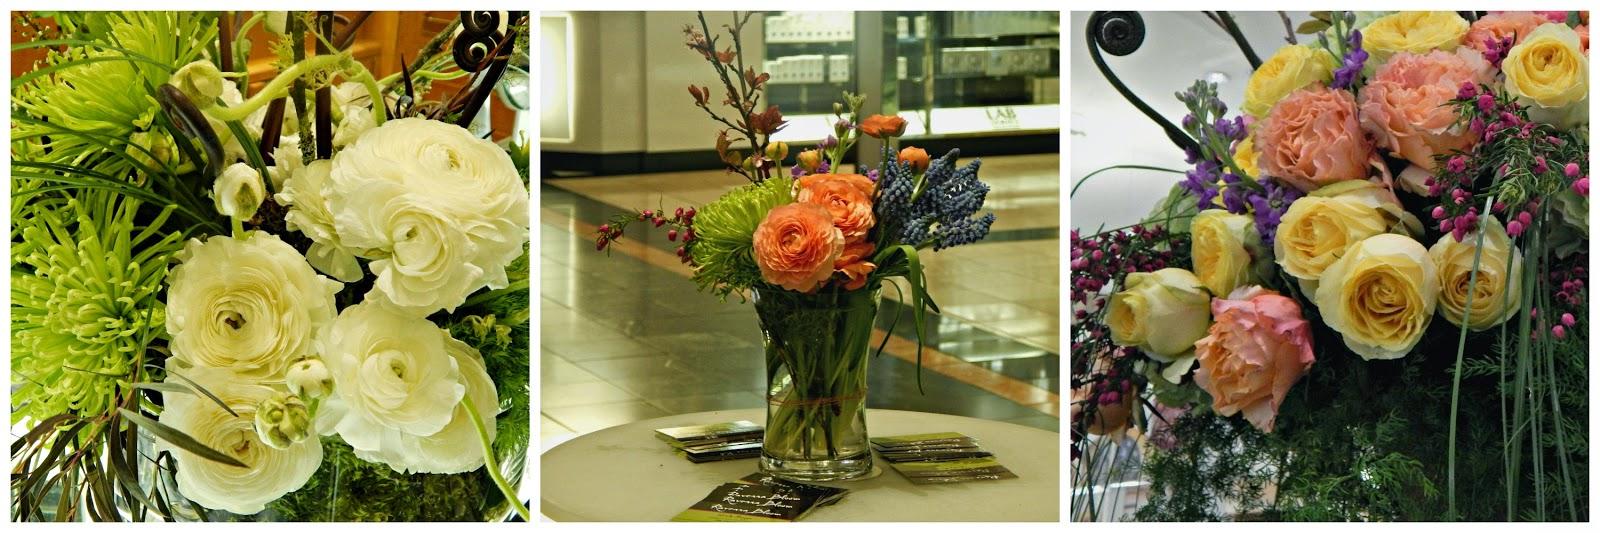 Macy's Flower Show // The Secret Garden